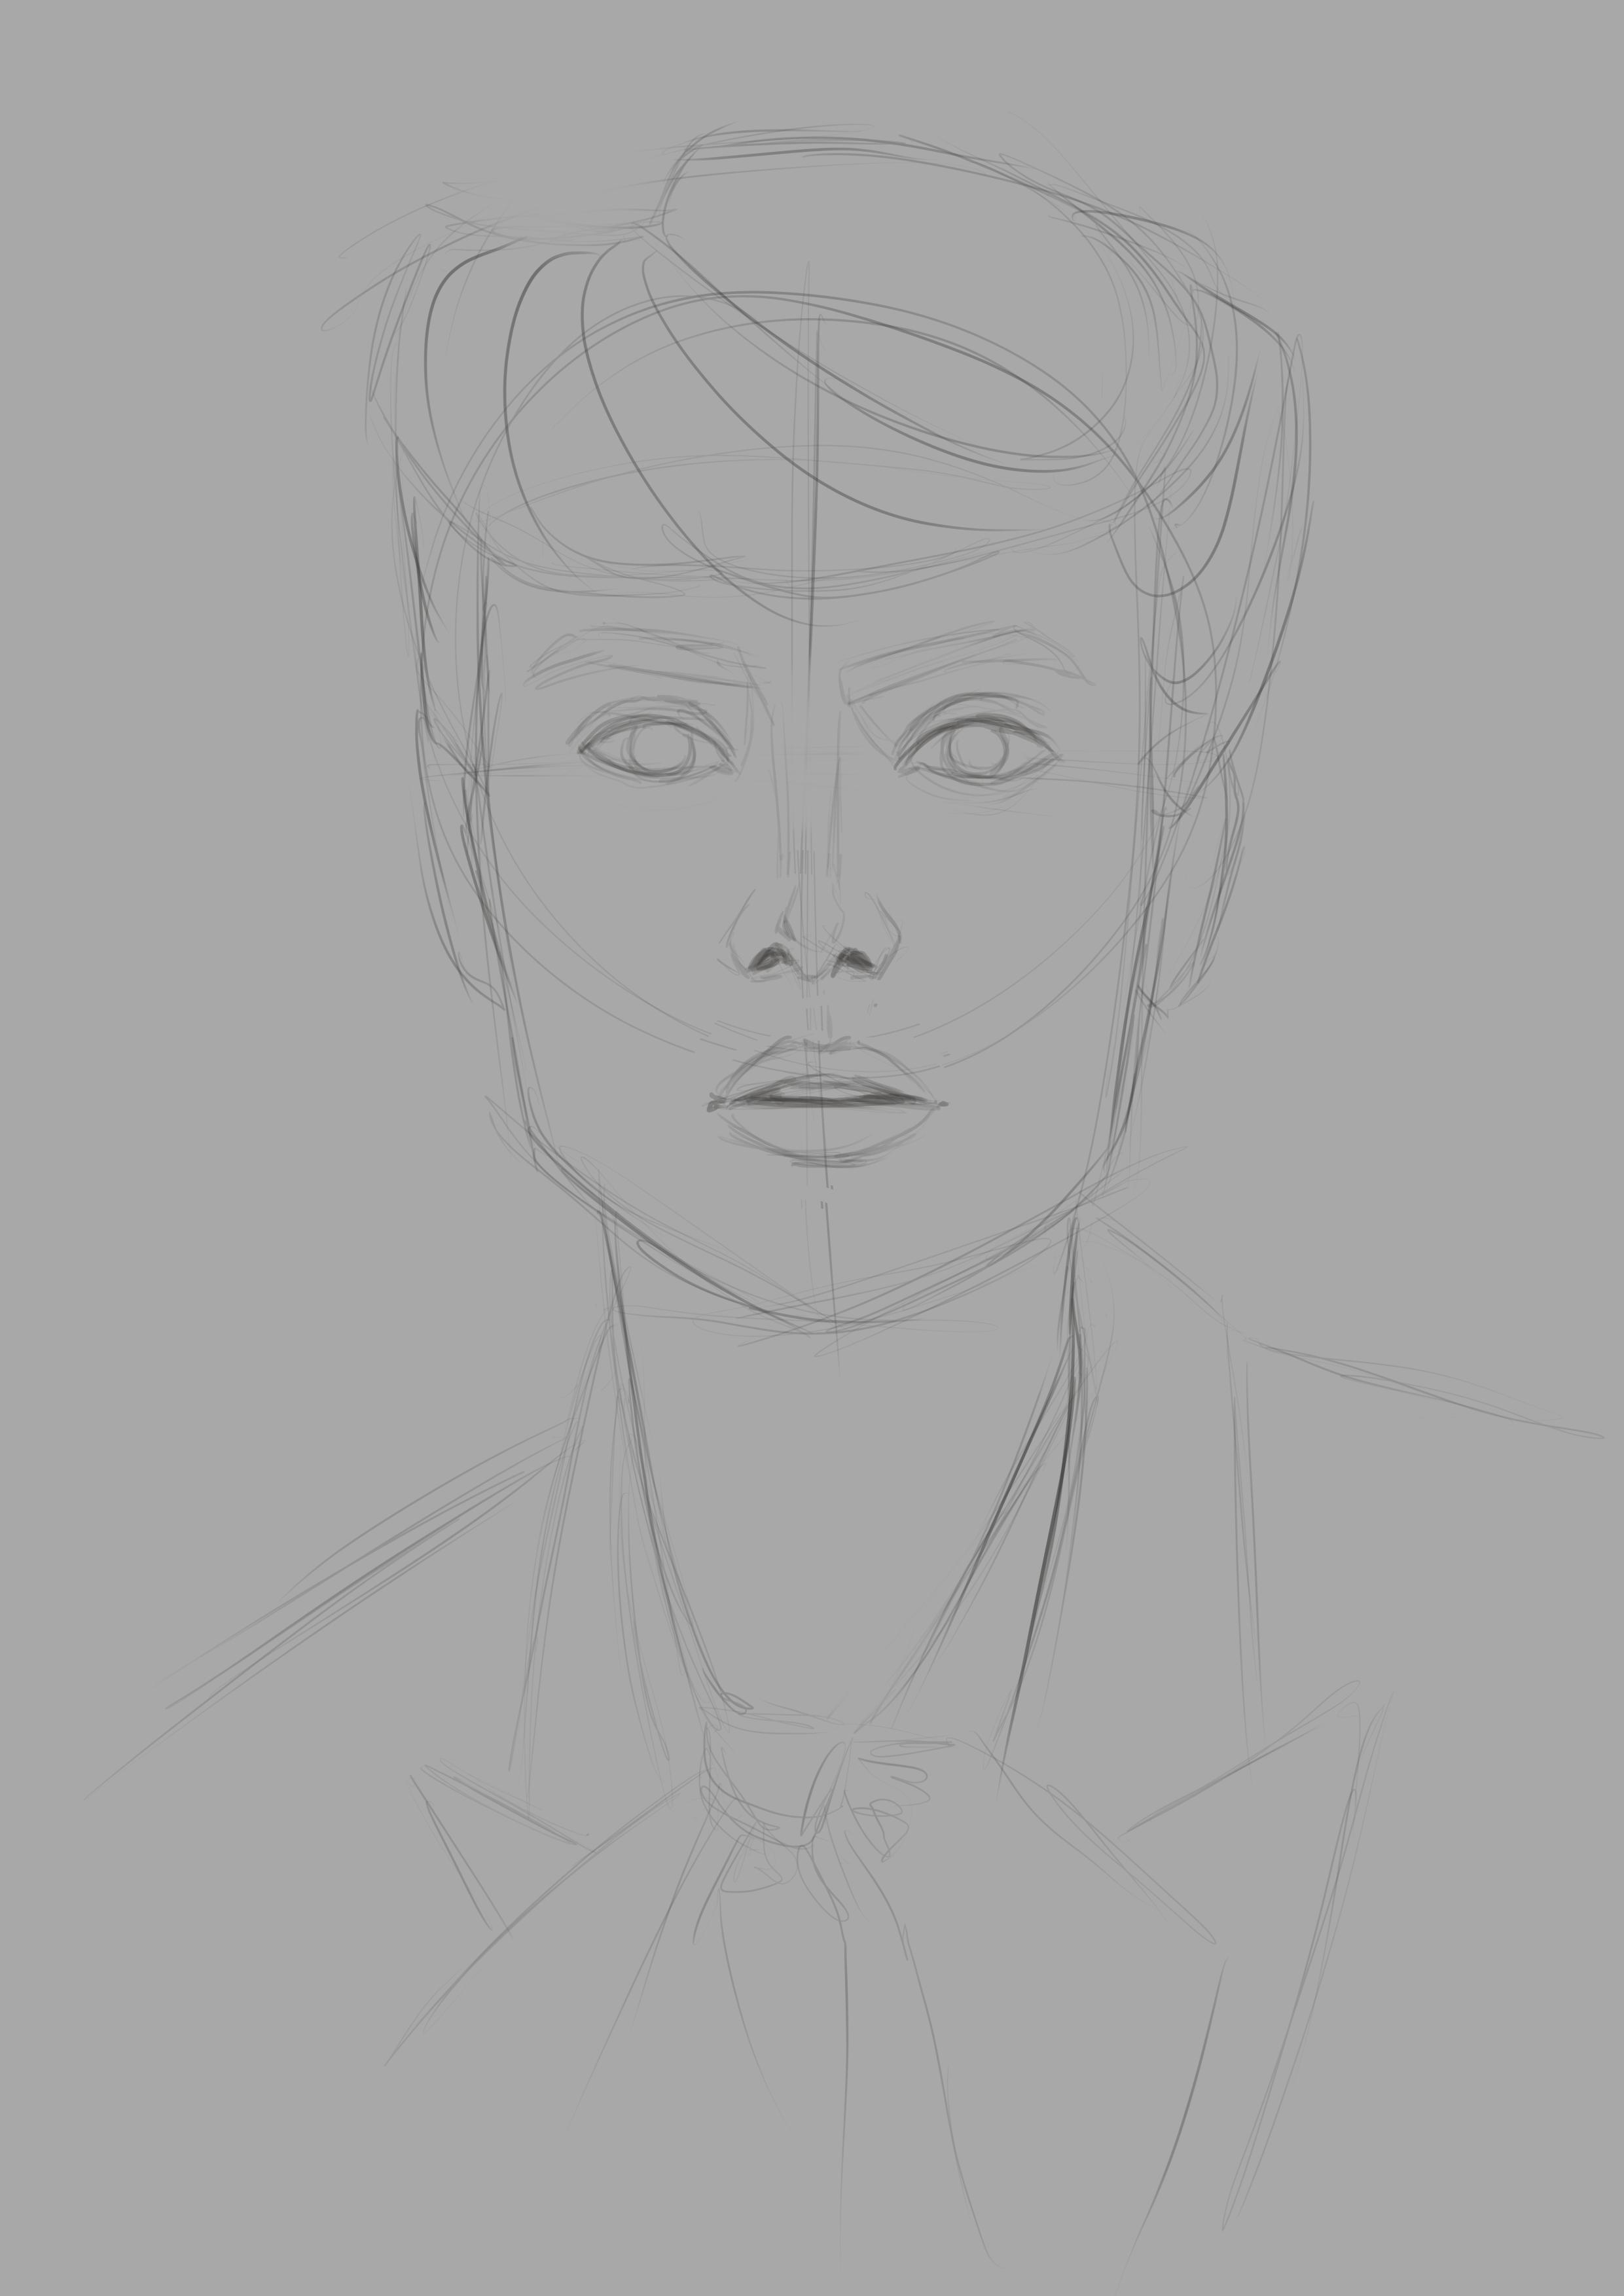 Sketch done in Clip Studio Paint Ex